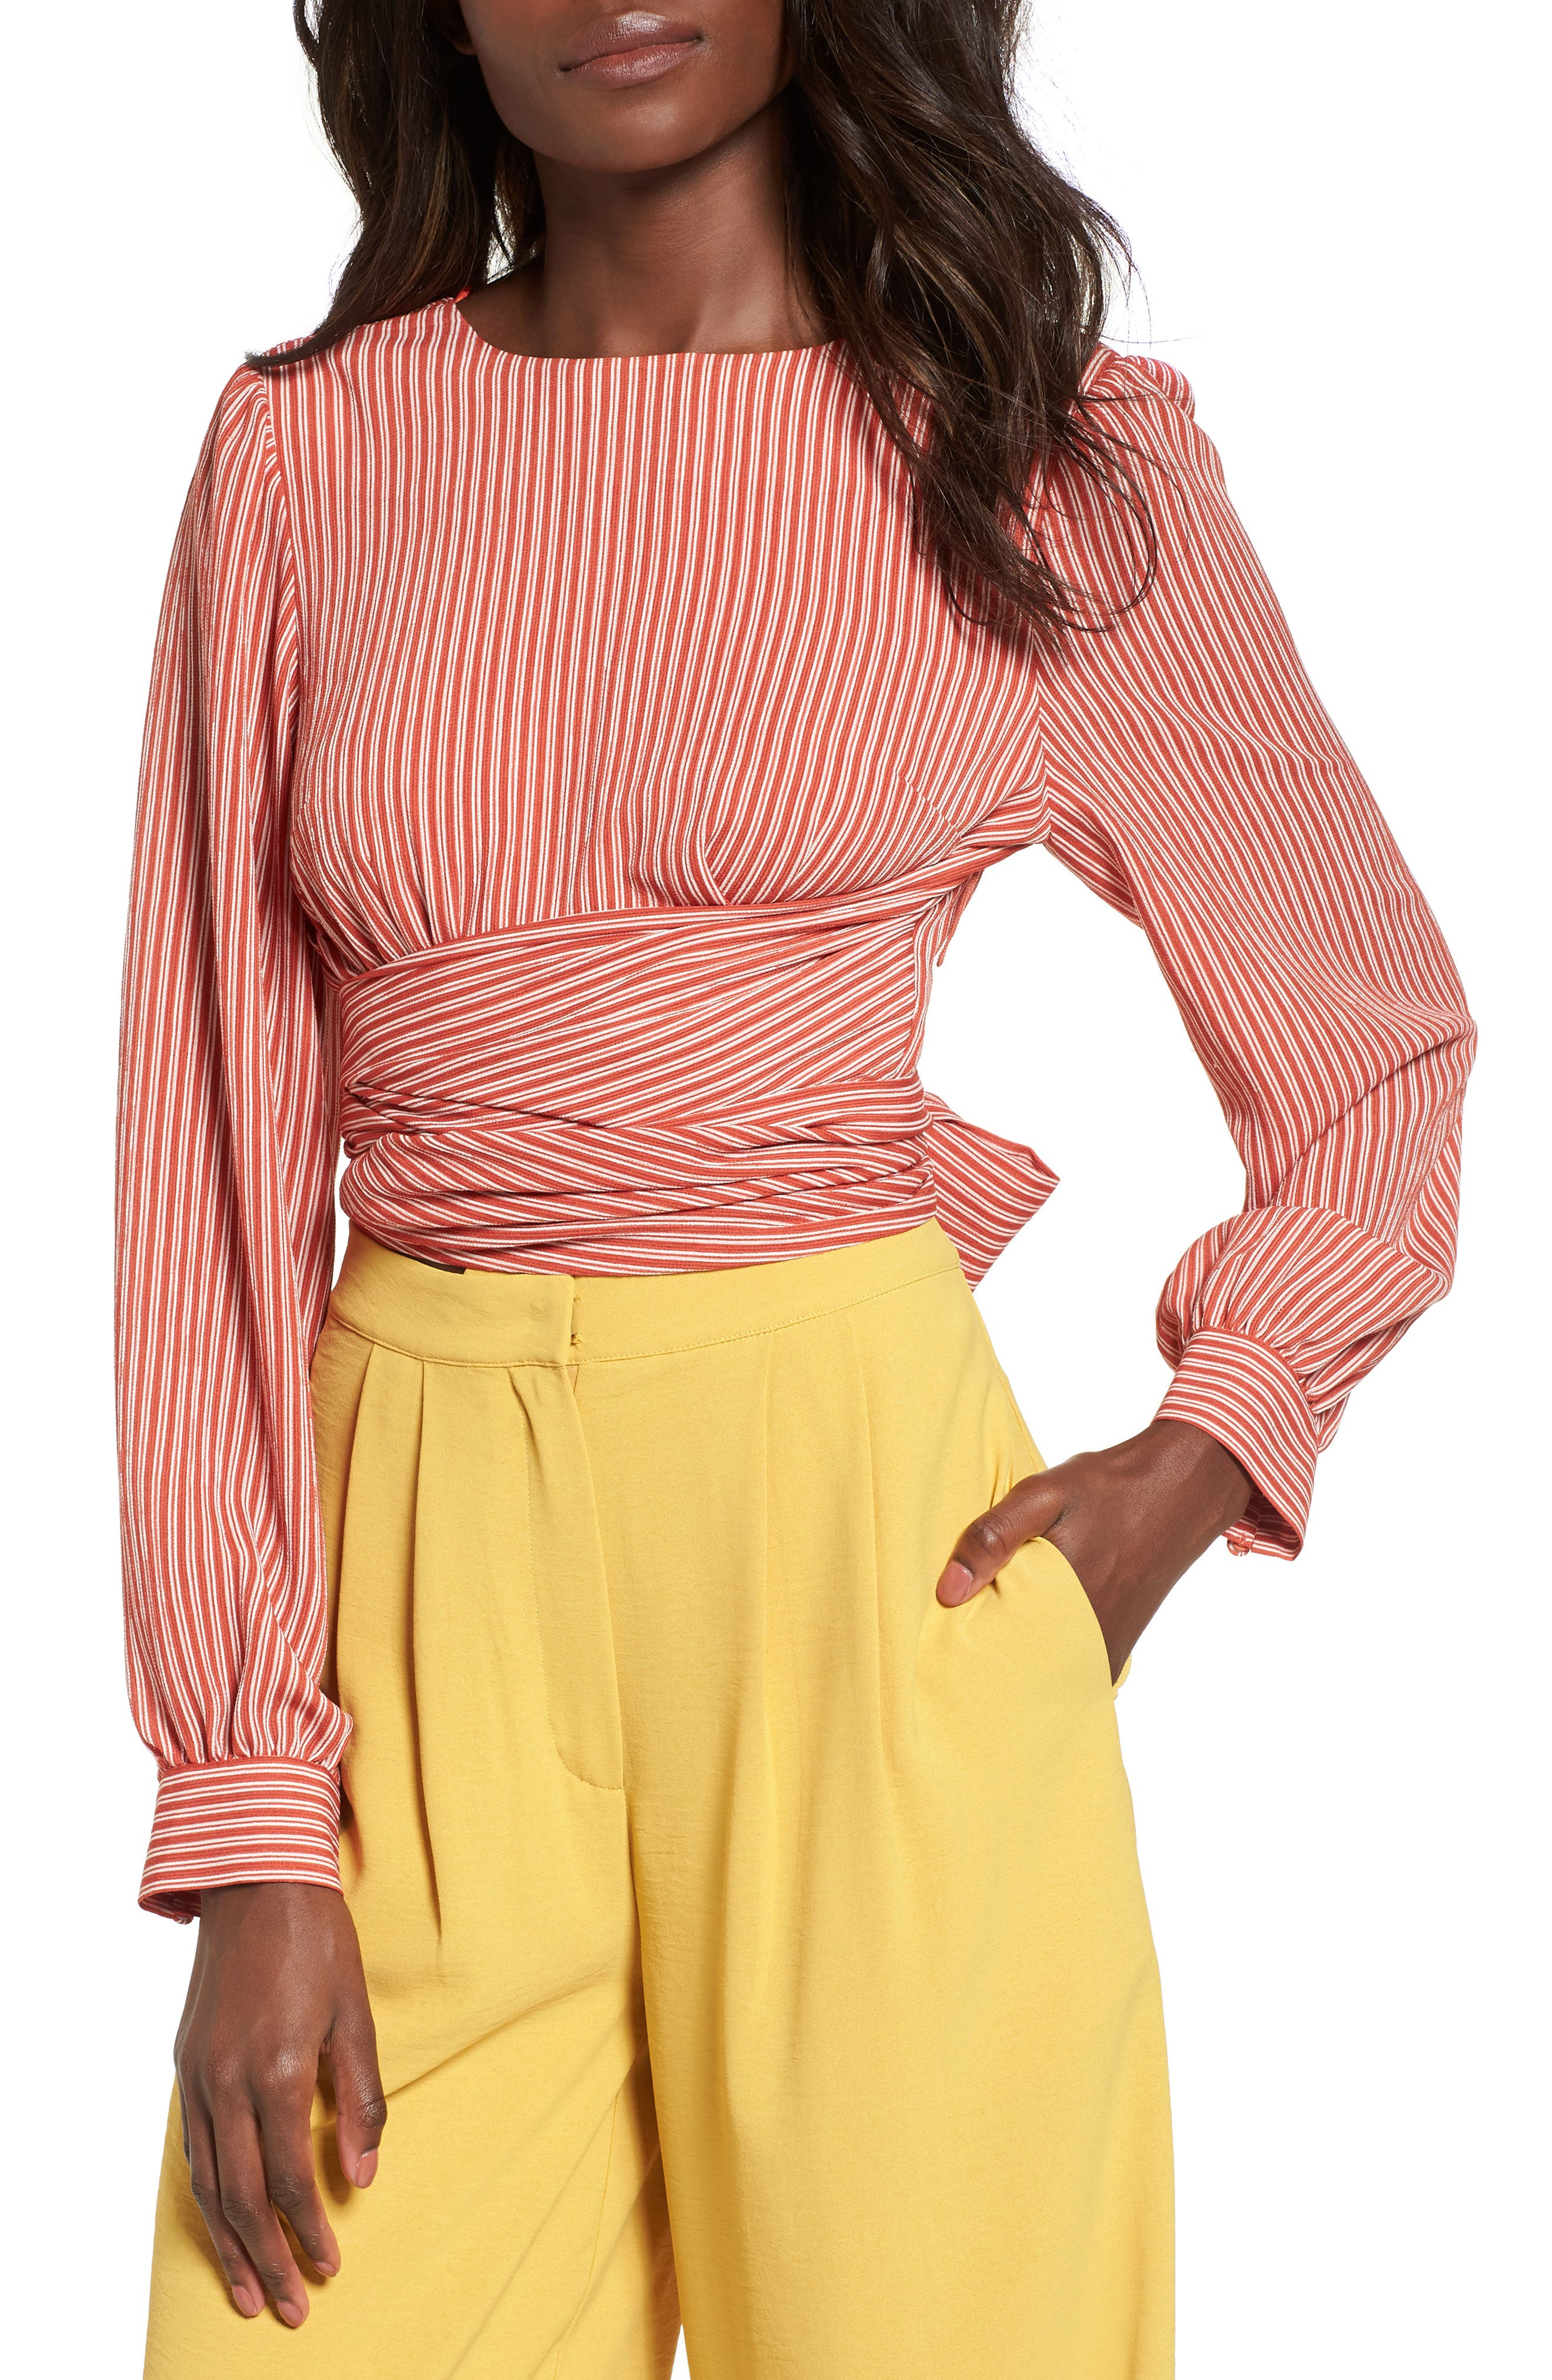 Chriselle x J.O.A. Tie Waist Top,                         Main,                         color, Patina Stripe